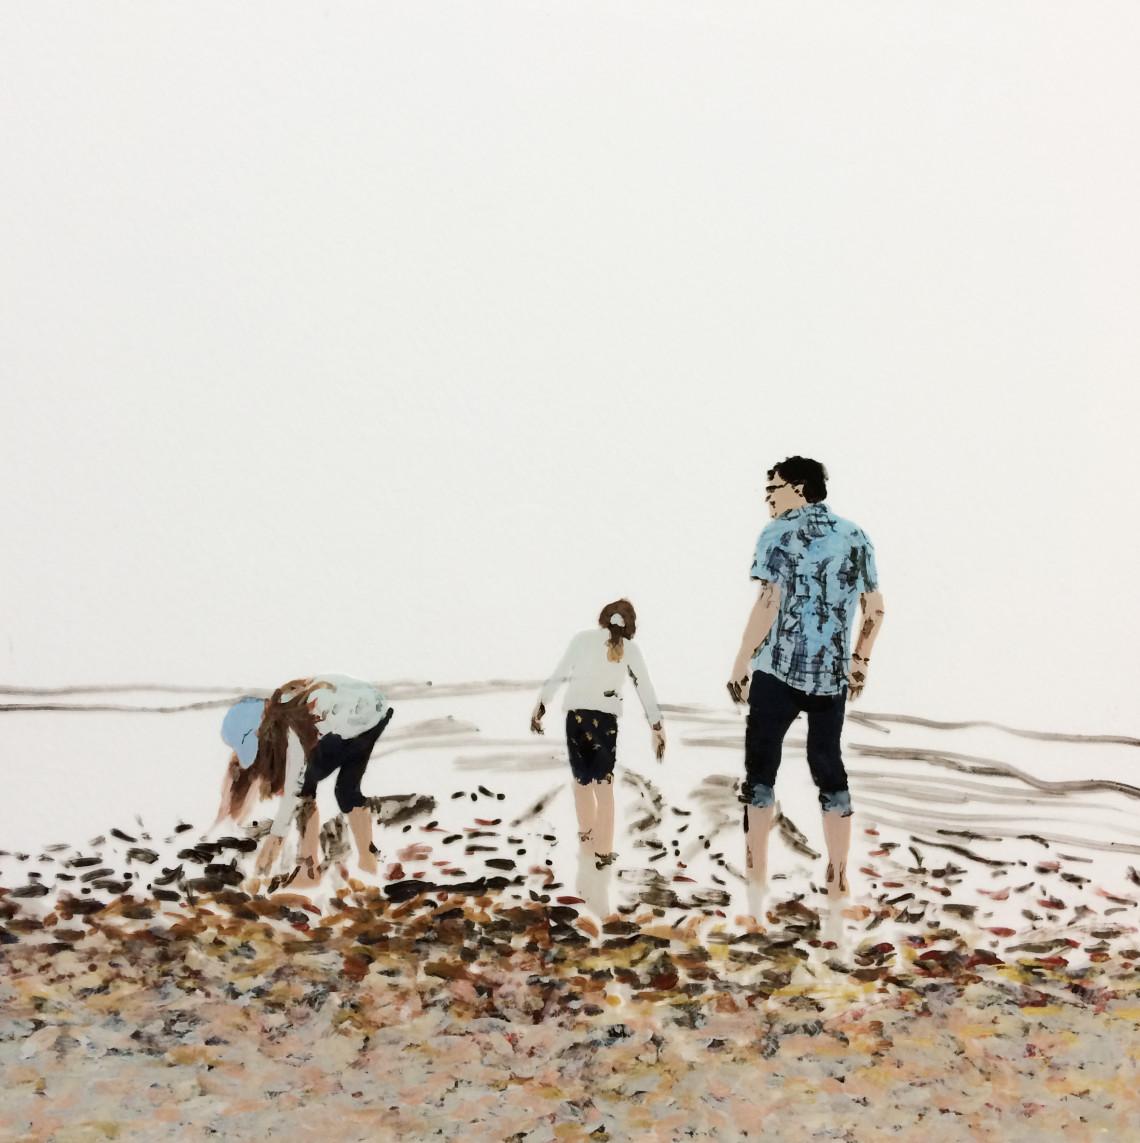 Familie, 2021, Hinterglasmalerei/ Acryl auf Glasplatte, 24 x 24 cm